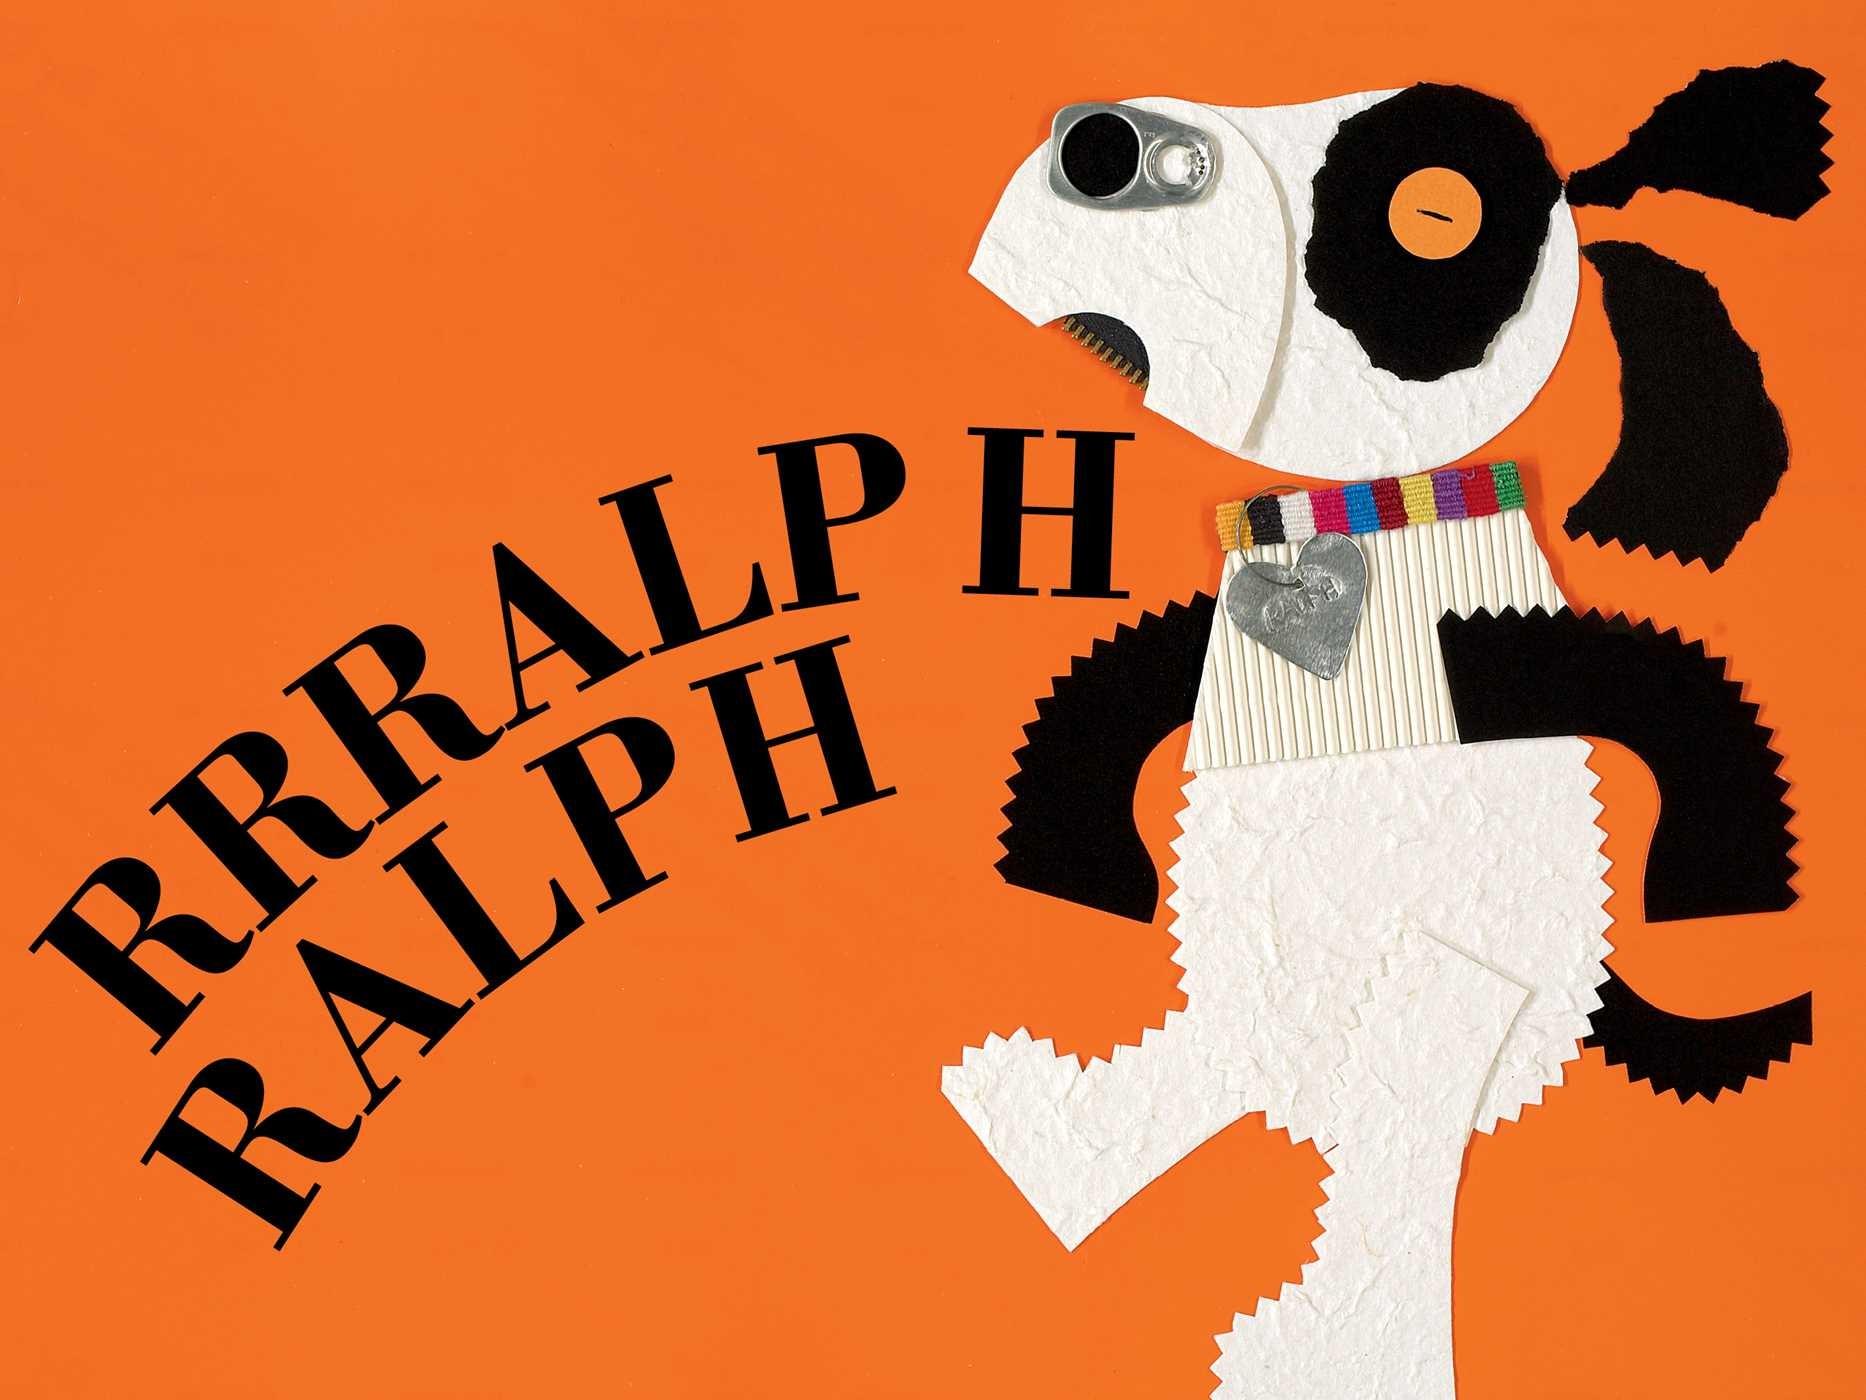 Rrralph 9781481452113.in01